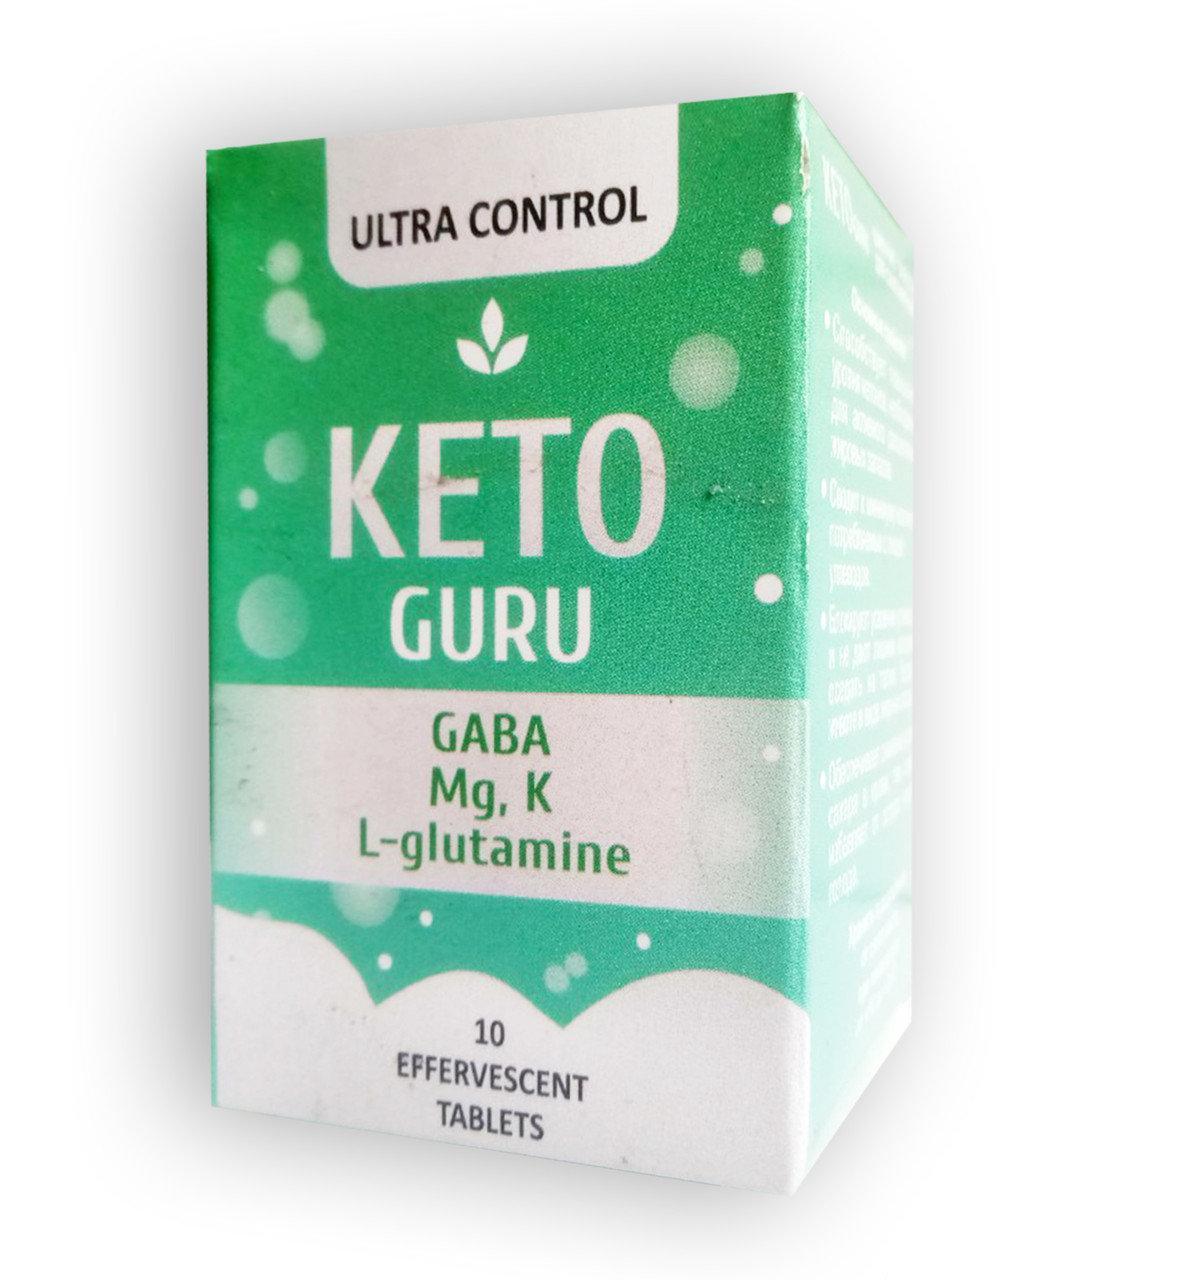 Keto Guru шипучие таблетки для похудения Кето Гуру ViP